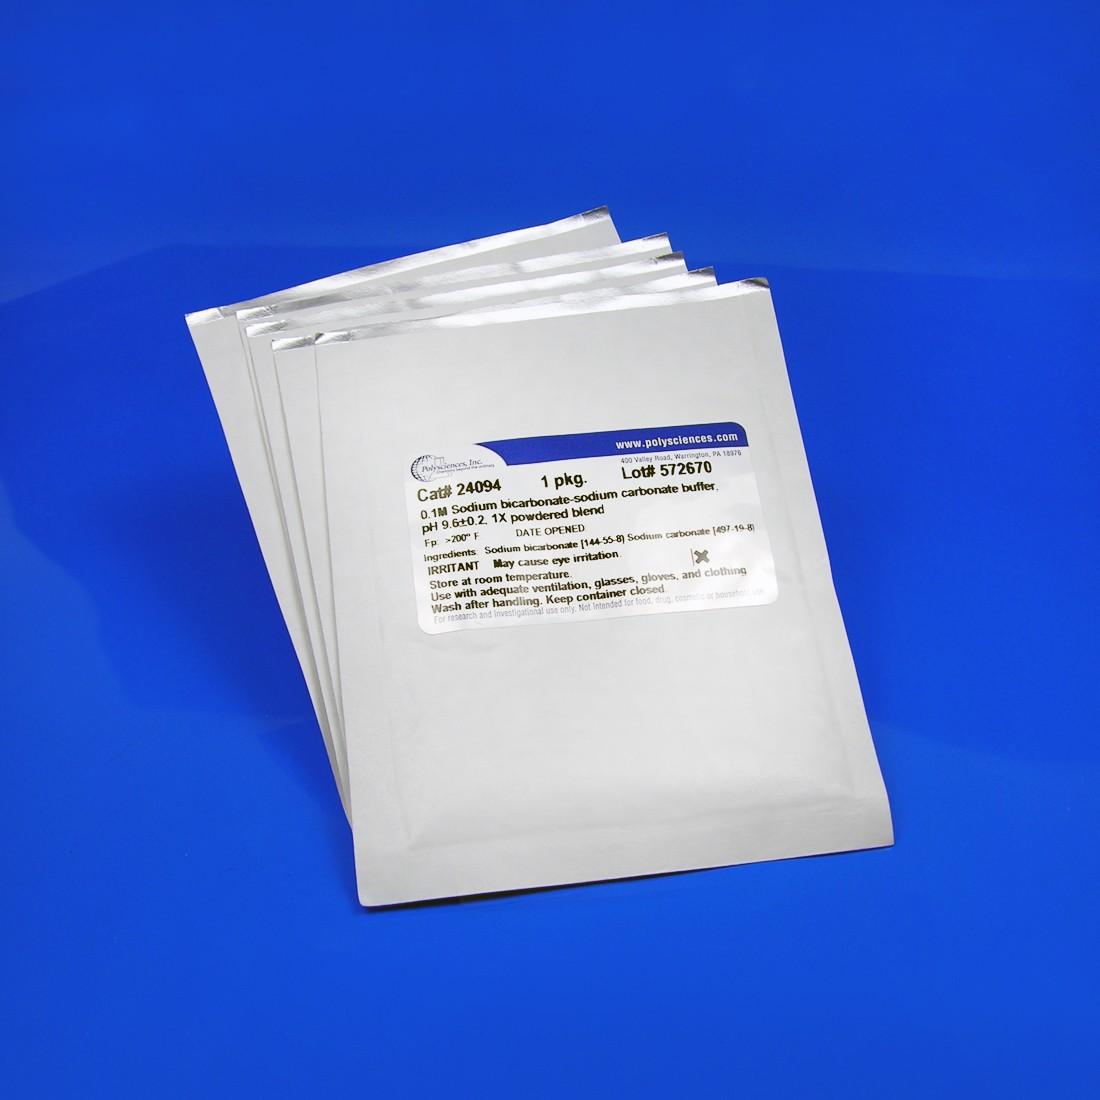 0.1M Sodium Bicarbonate-Sodium Carbonate Buffer, pH 9.6 ±0.2, 1X  Powdered Blend